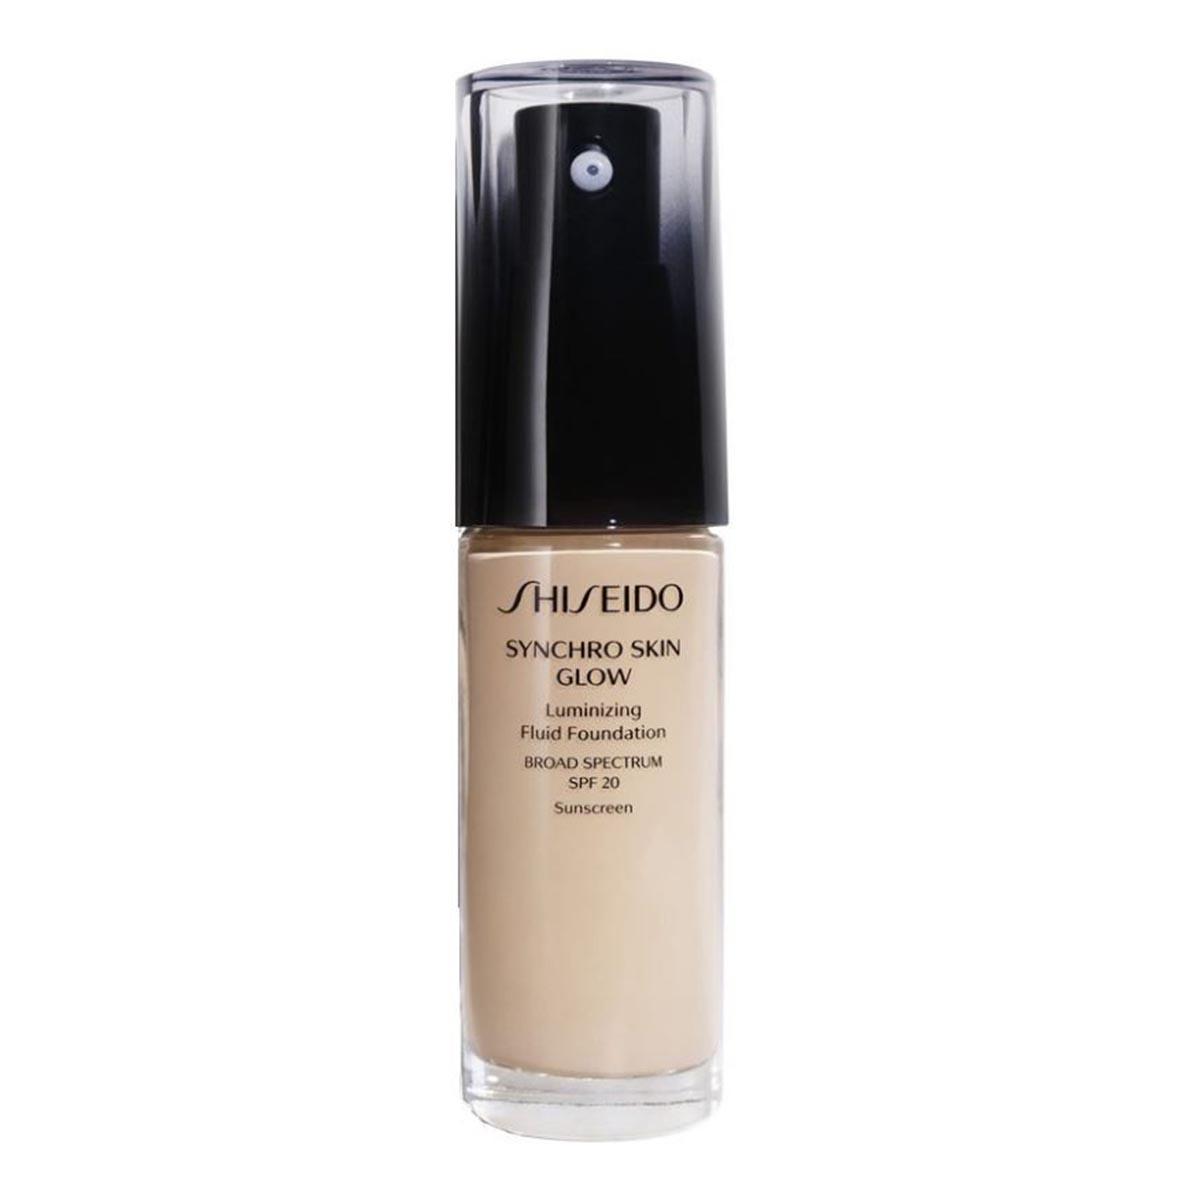 Shiseido synchro skin glow luminizing fluid foundation b40 30ml